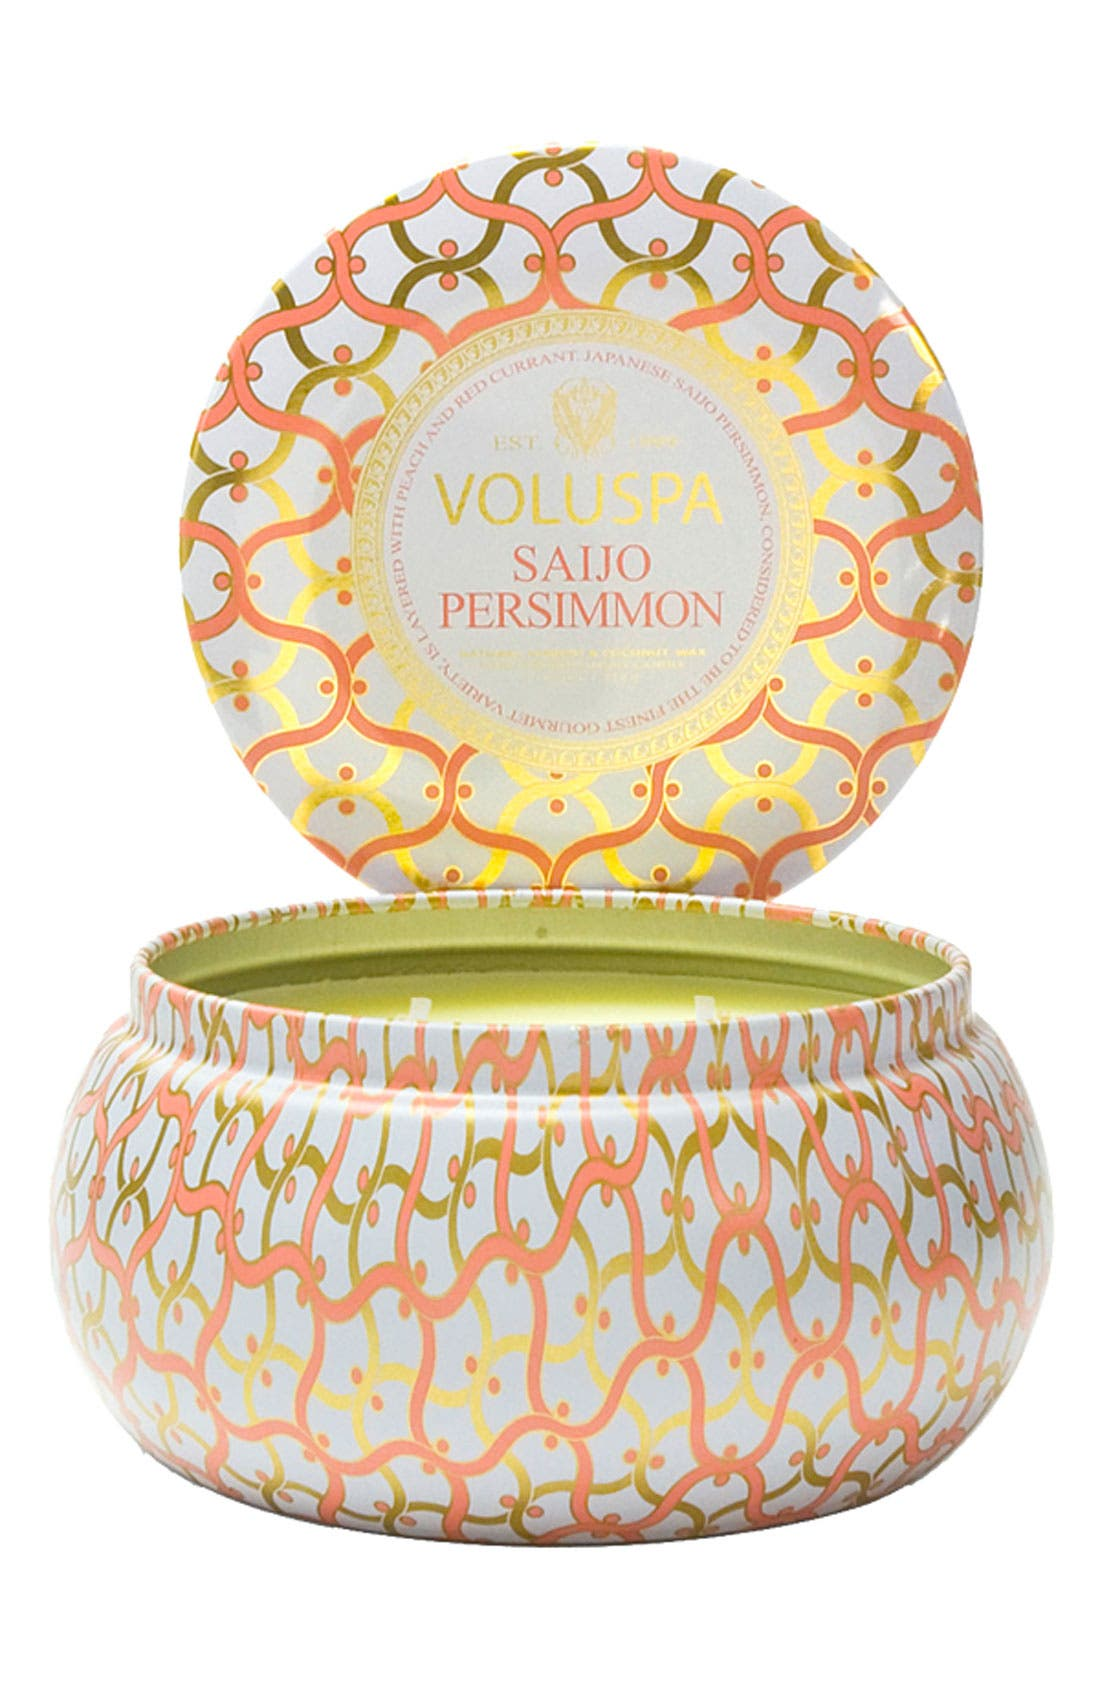 Main Image - Voluspa Maison Blanc Saijo Persimmon 2-Wick Candle